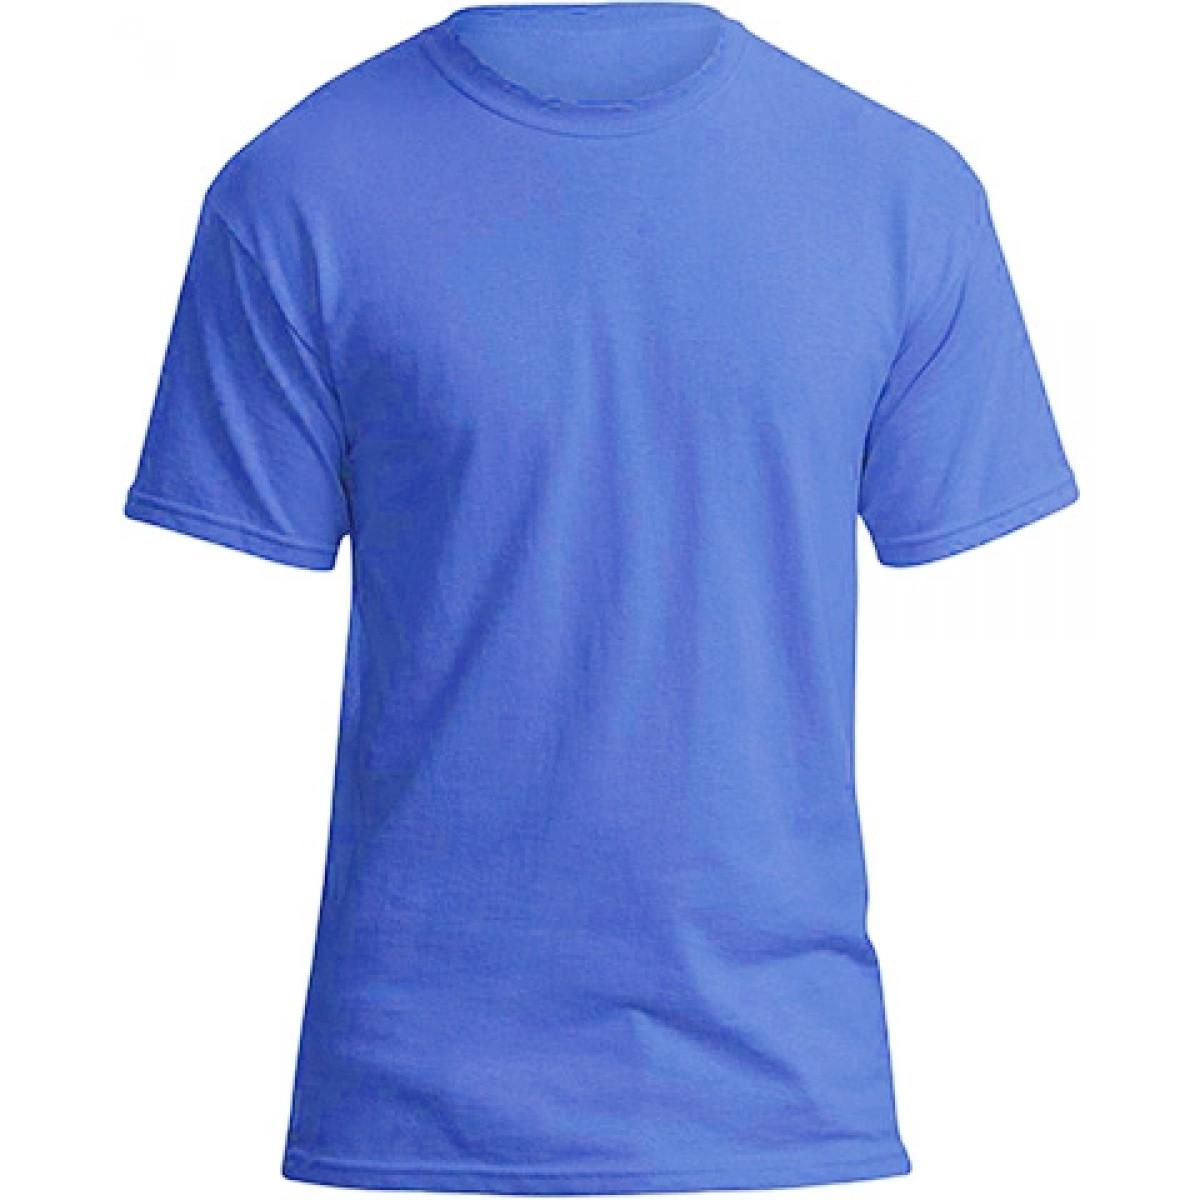 Soft 100% Cotton T-Shirt-Heather Blue-YM